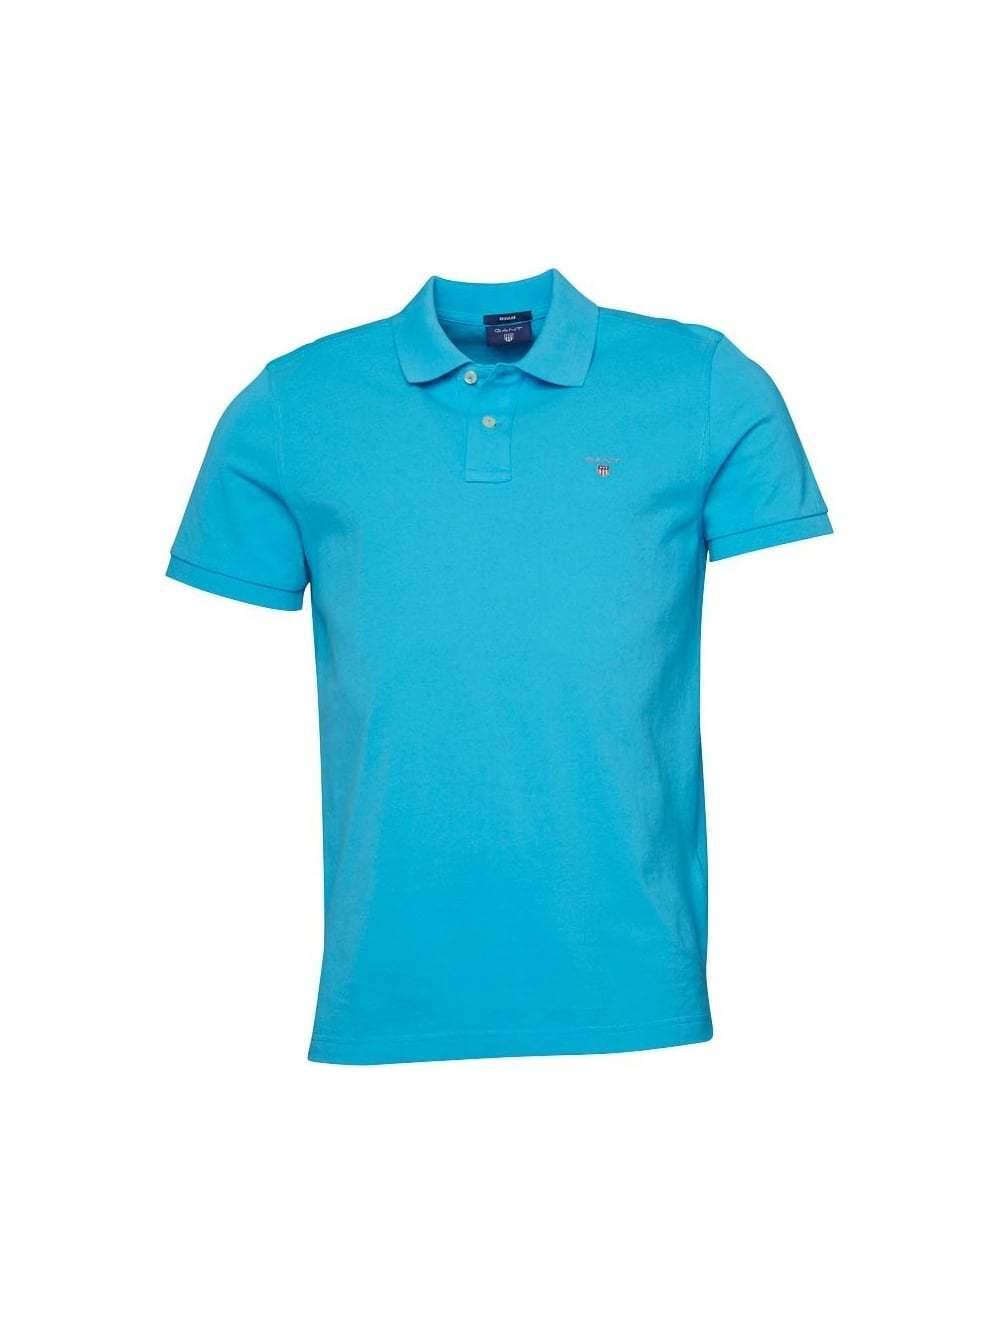 GANT Turquoise blu Classic Polo Shirt